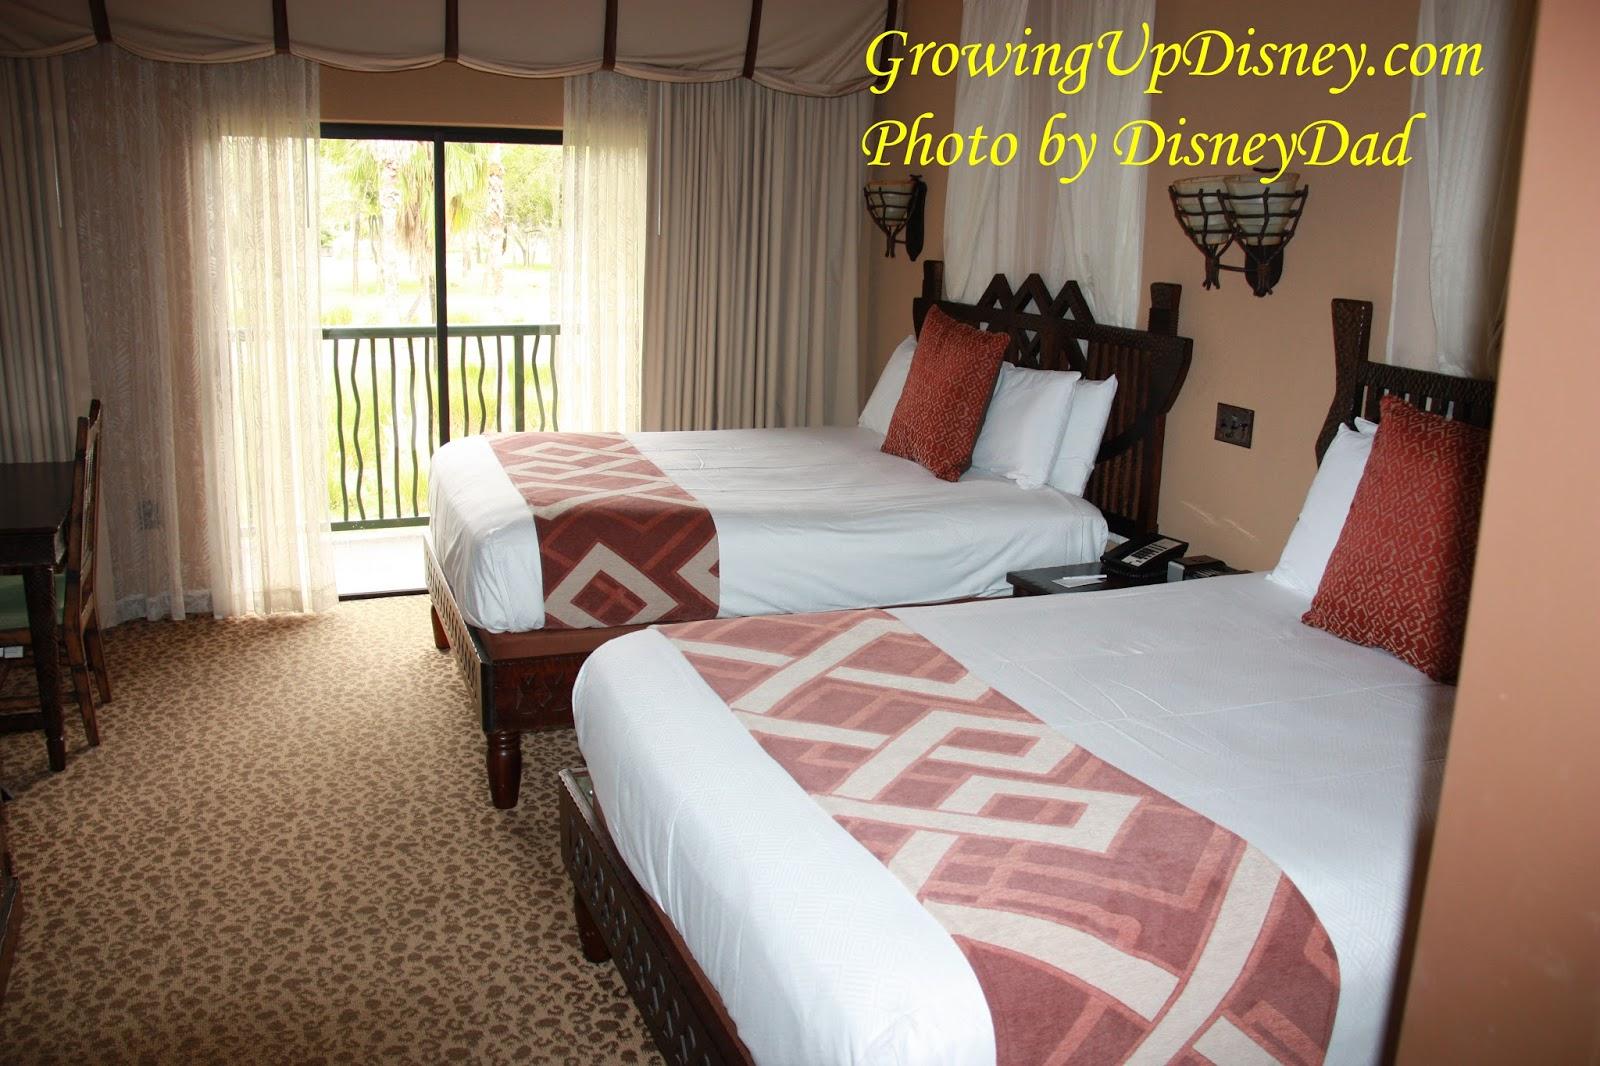 Growing Up Disney Photo Flashback Kidani Village 2 Bedroom Villa